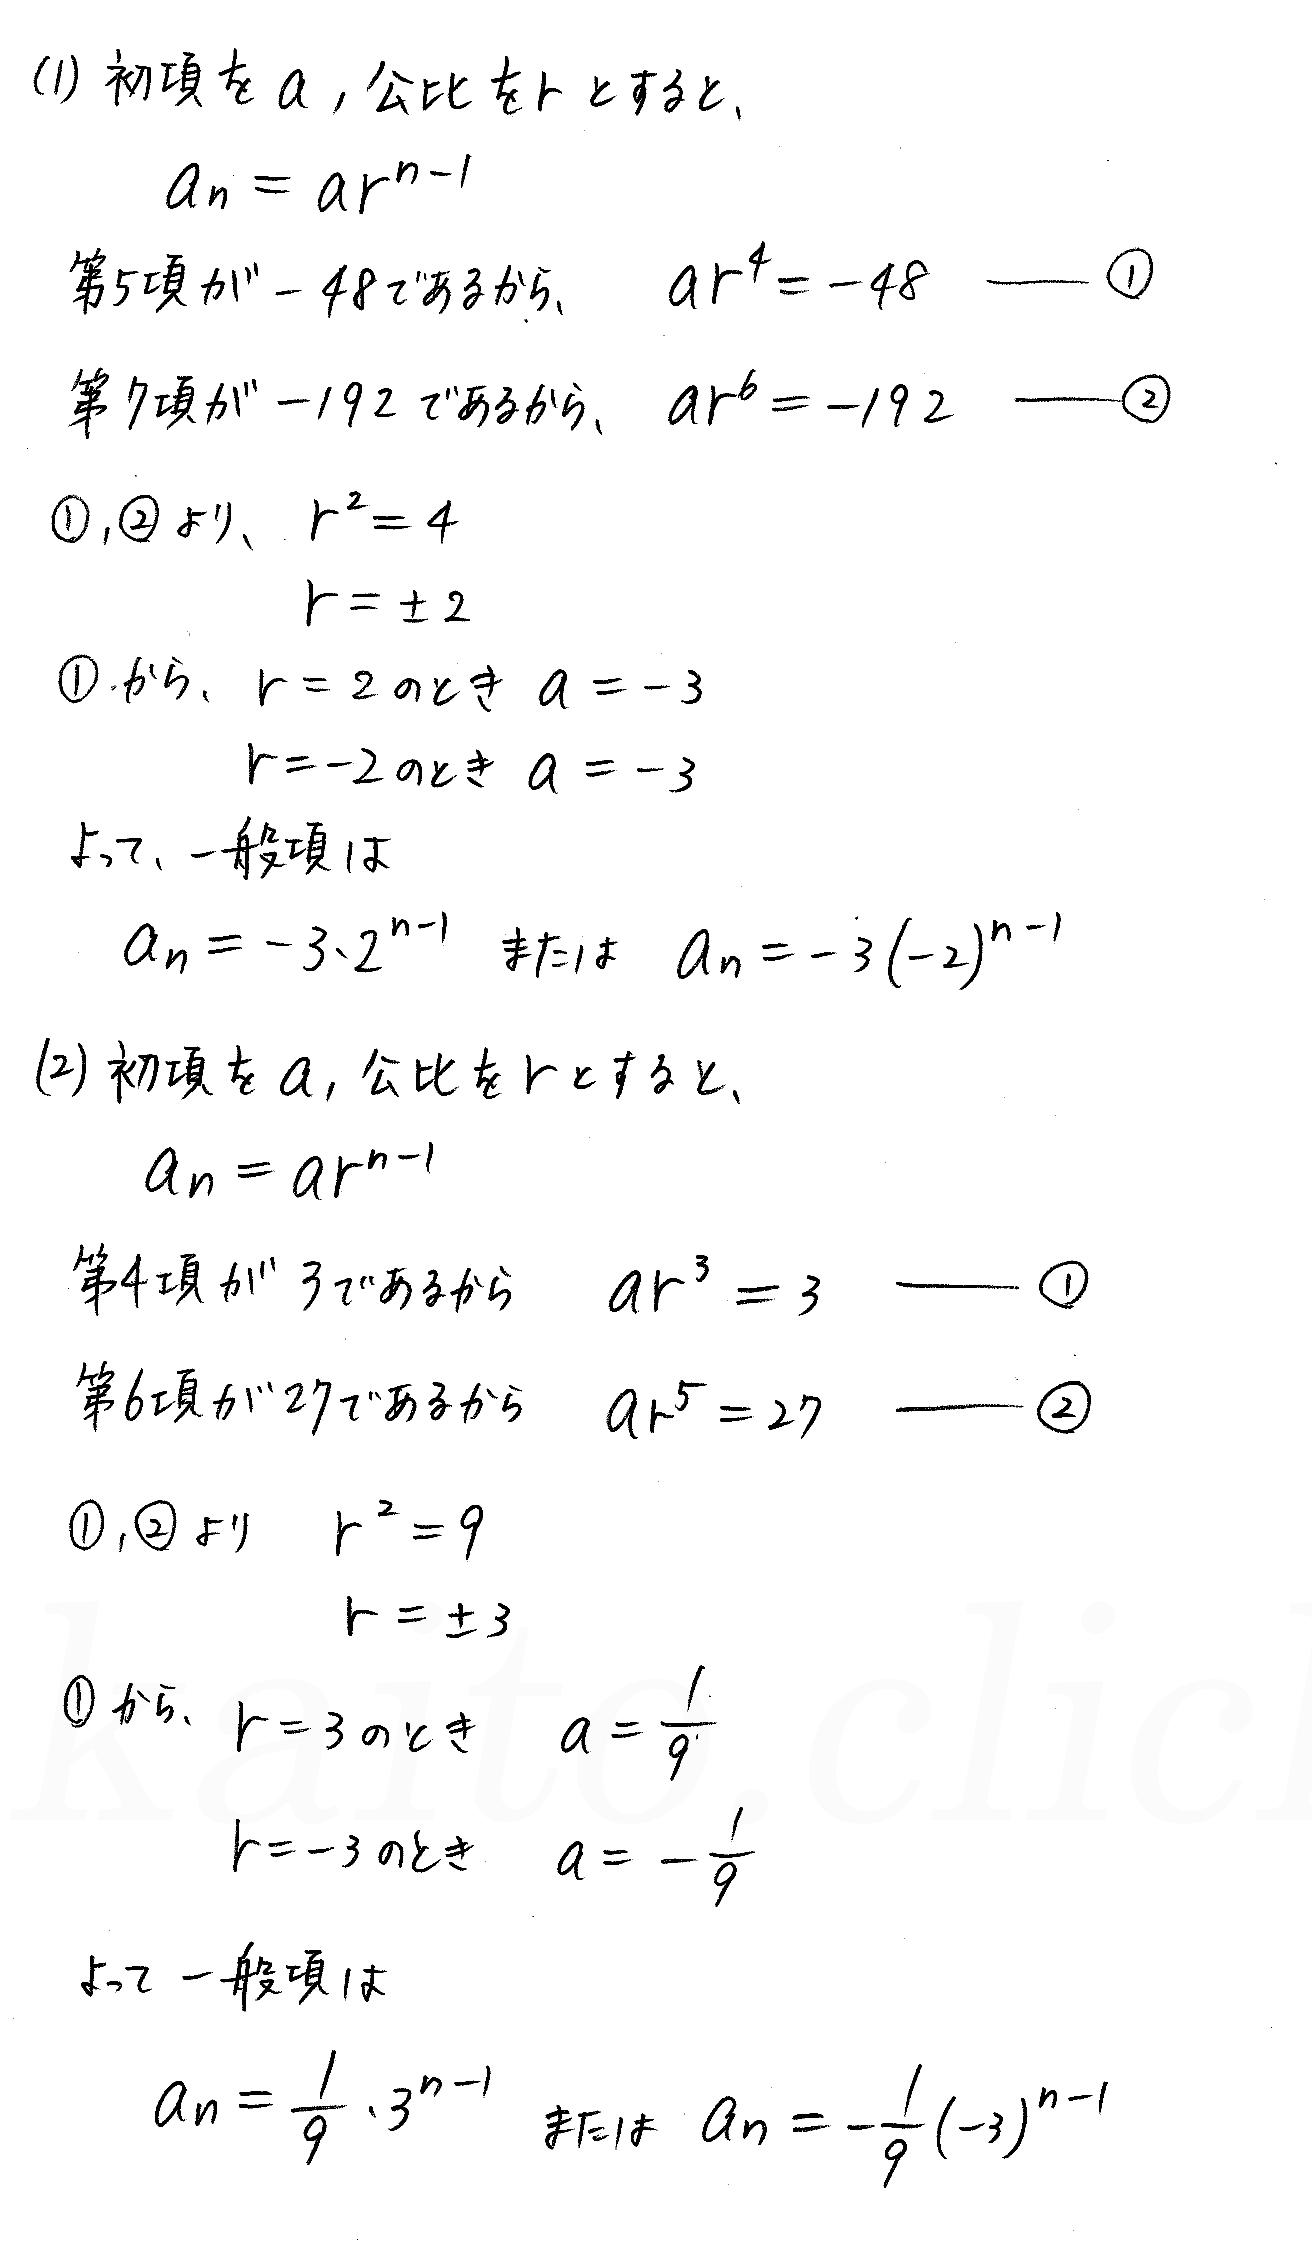 3TRIAL数学B-173解答